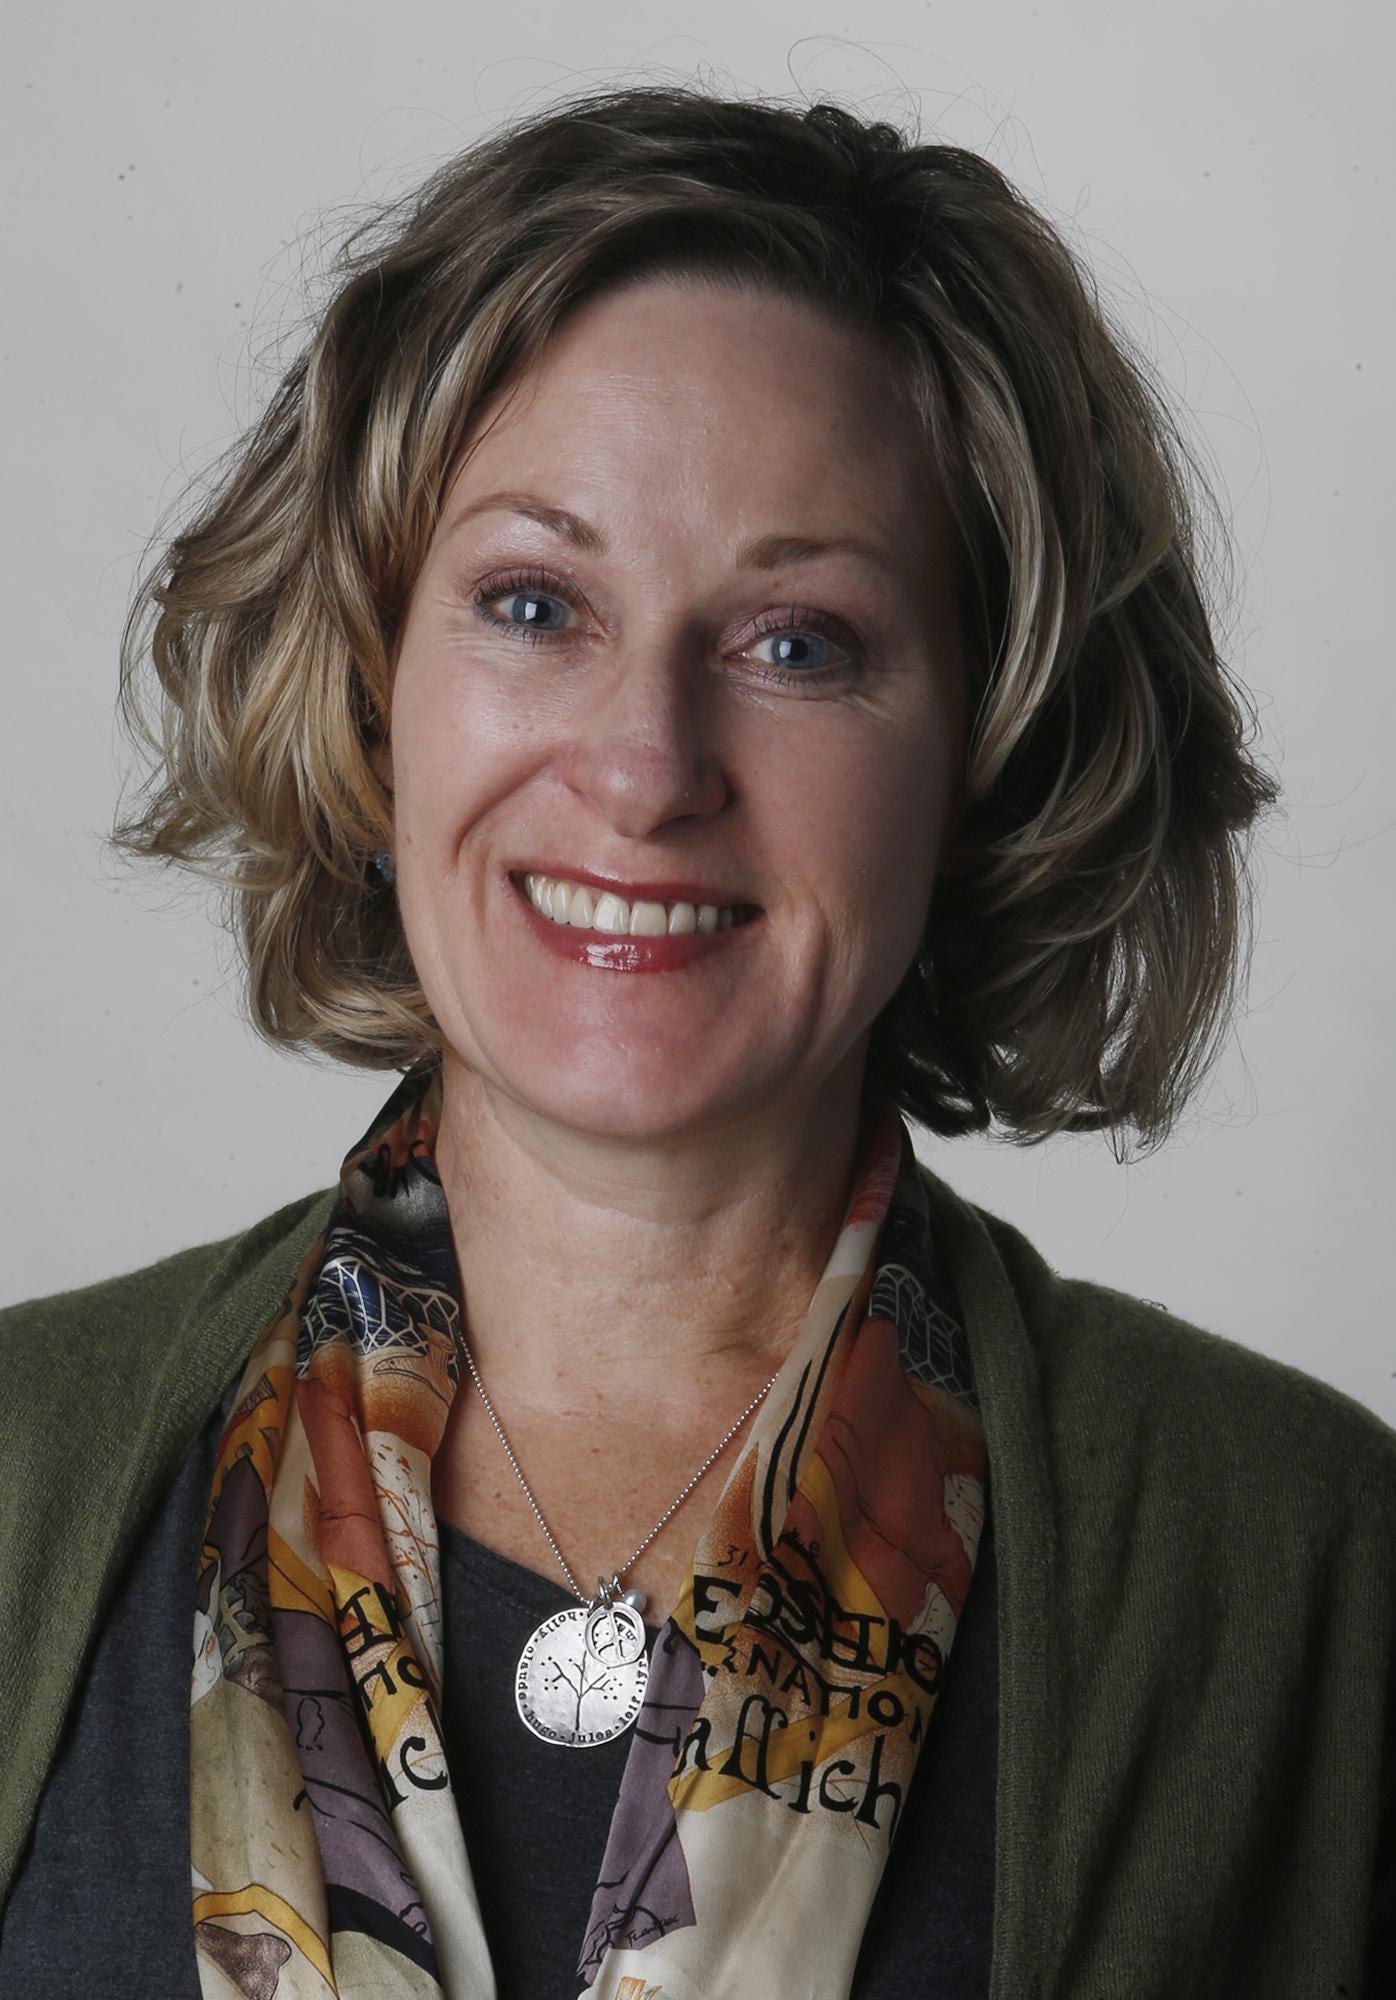 beaconjournal.com - Holly Christensen, Akron Beacon Journal - Holly Christensen: Music transports you back in time